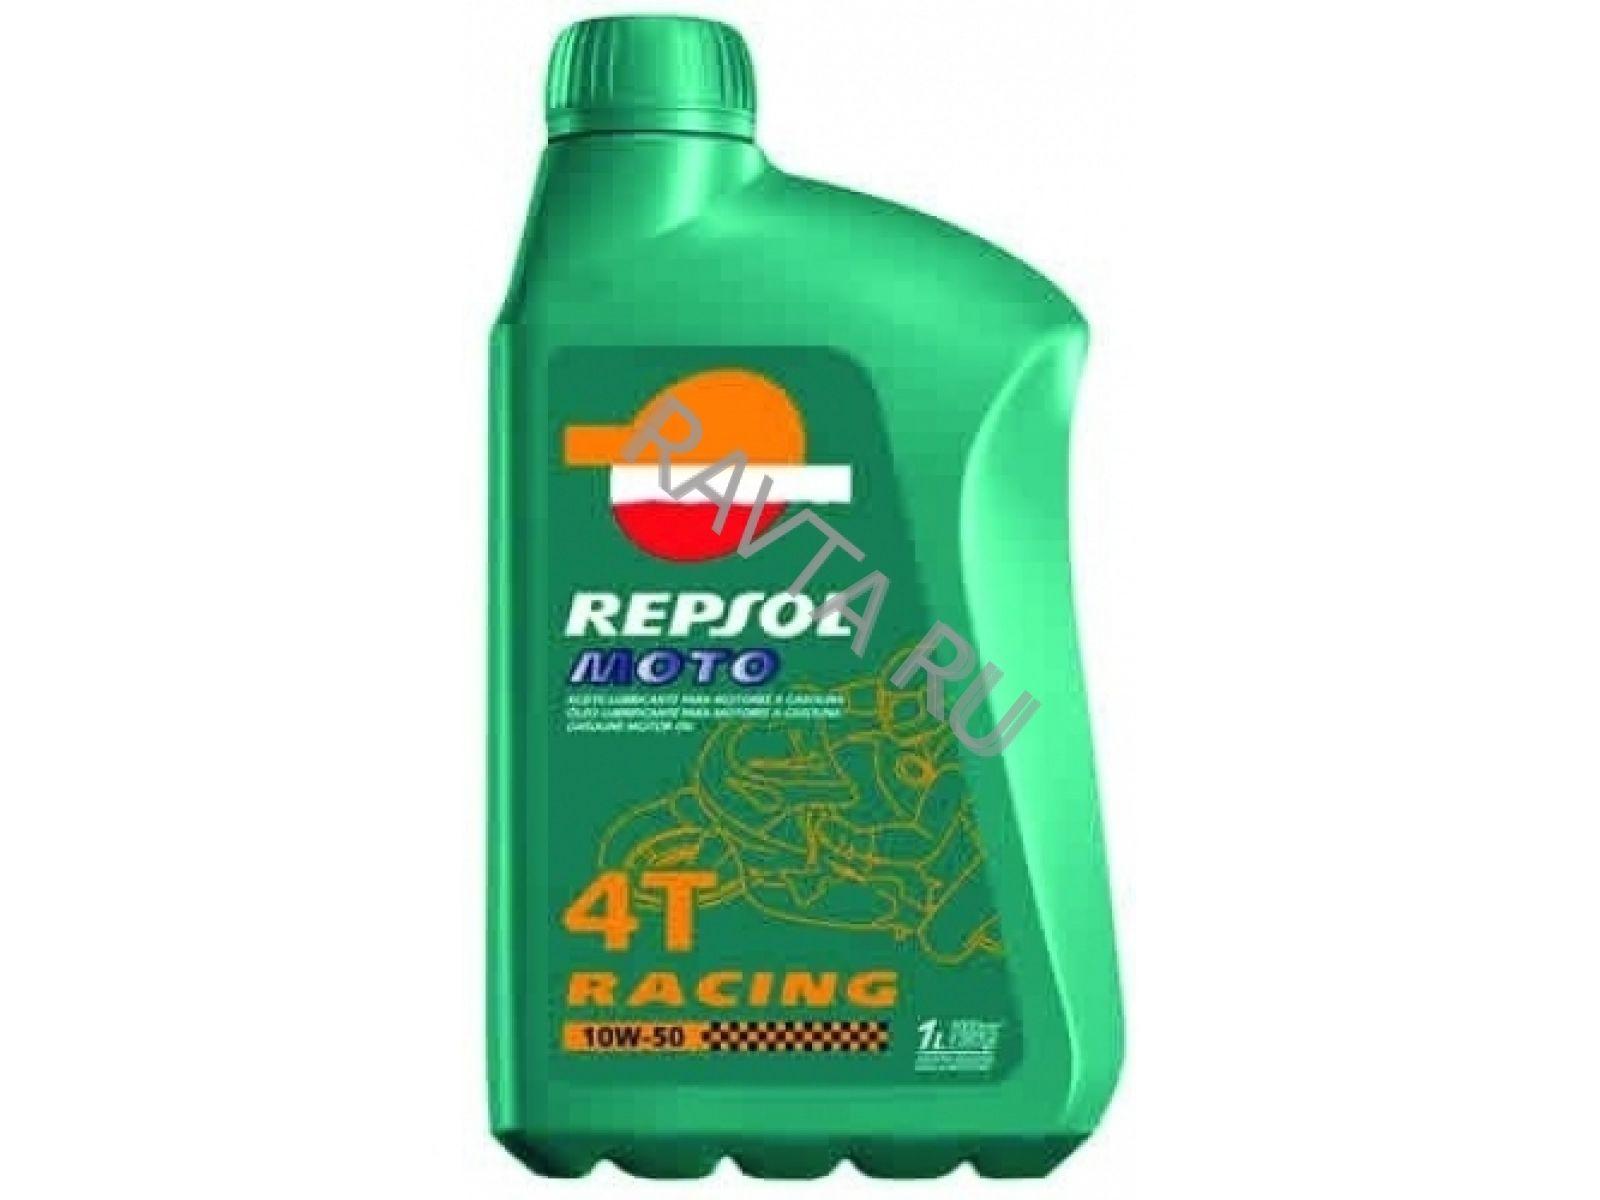 Масло Repsol Moto Racing 4T 10W-50 (1л) от Ravta